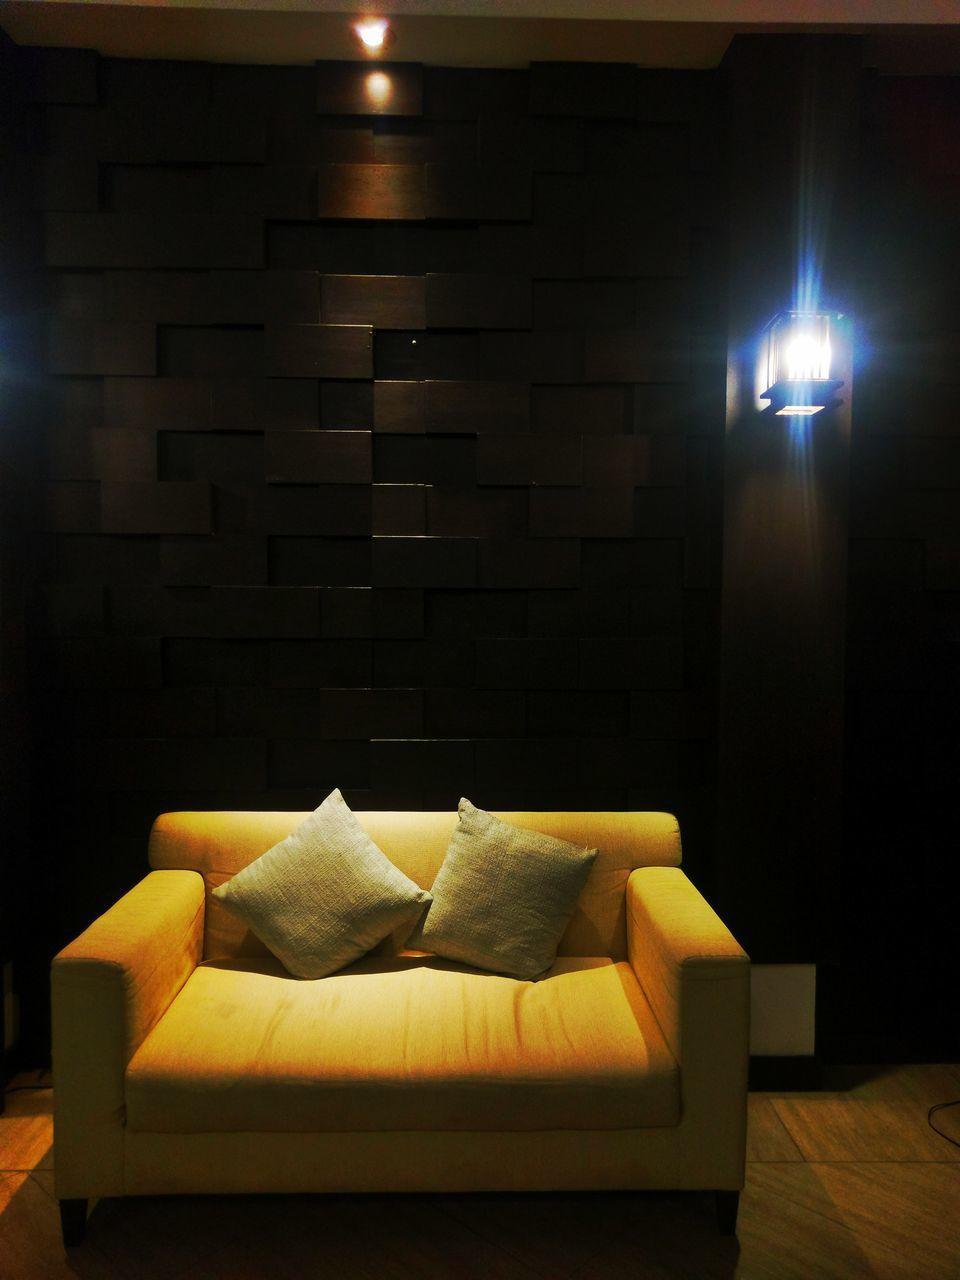 VIEW OF ILLUMINATED LAMP AT HOME